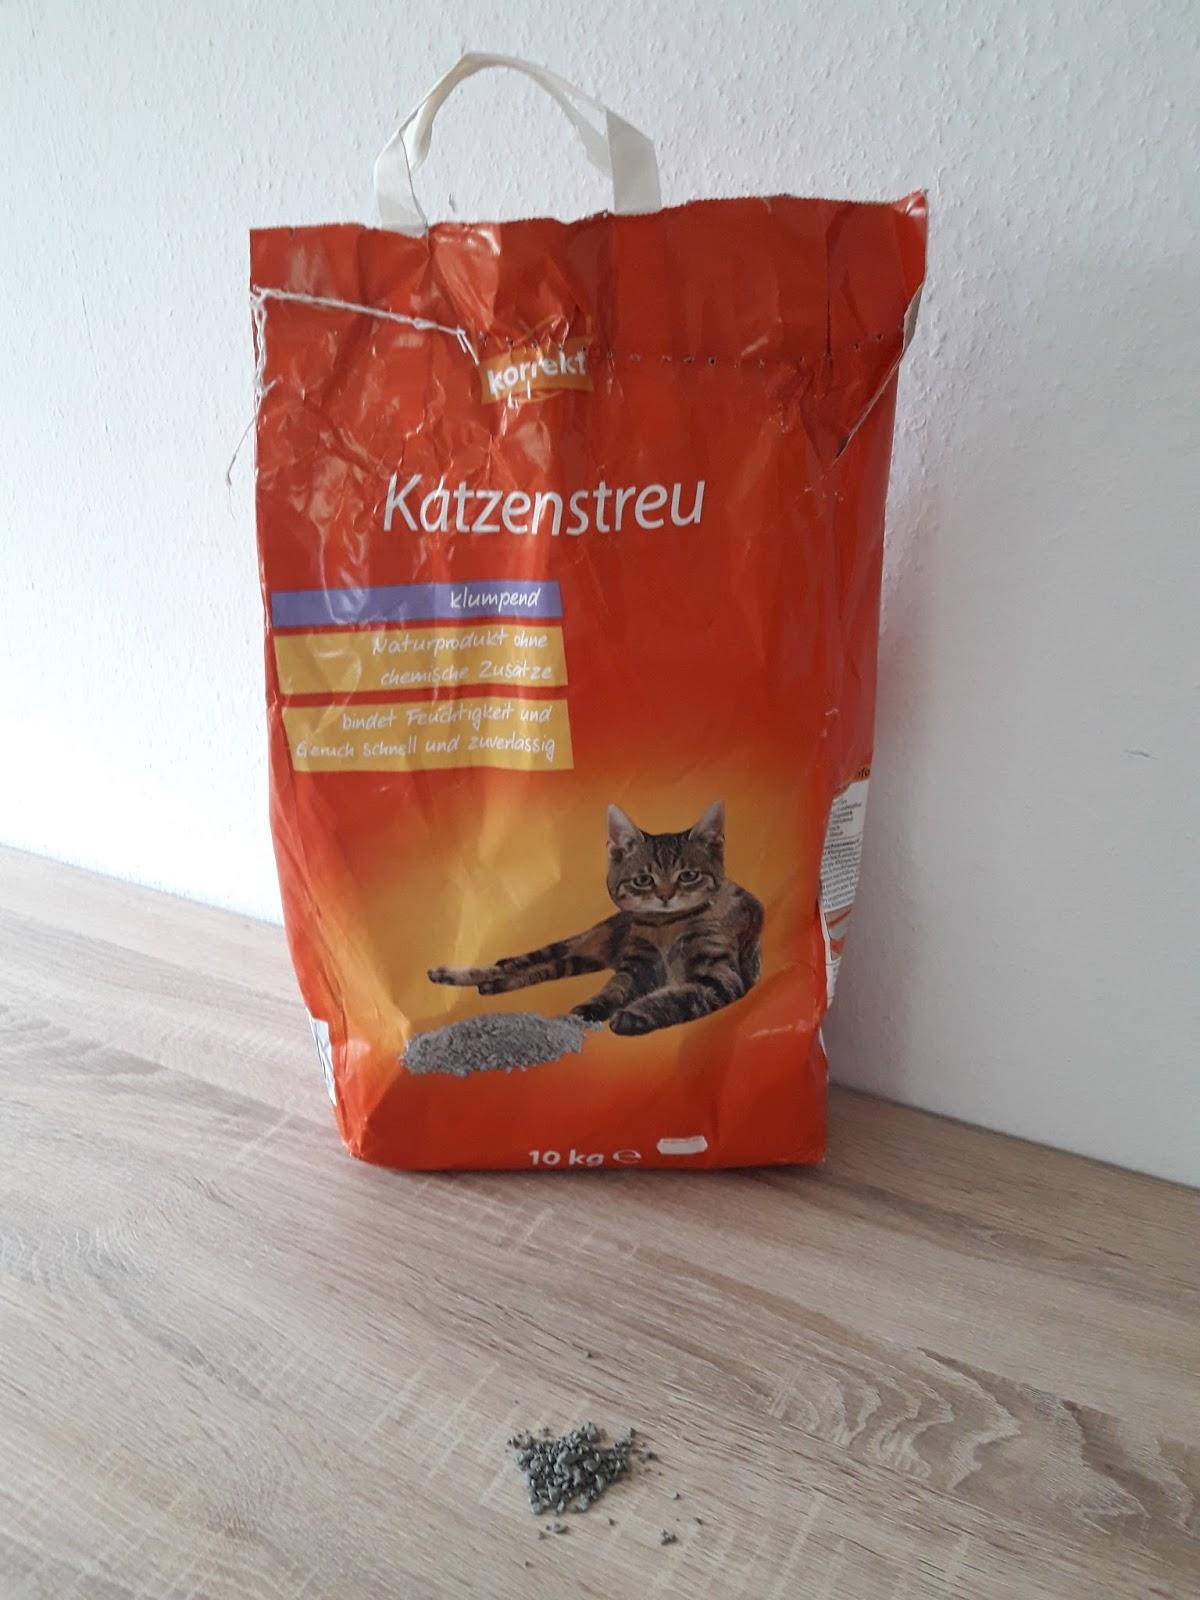 Review Korrekt Katzenstreu Klumpend Globus